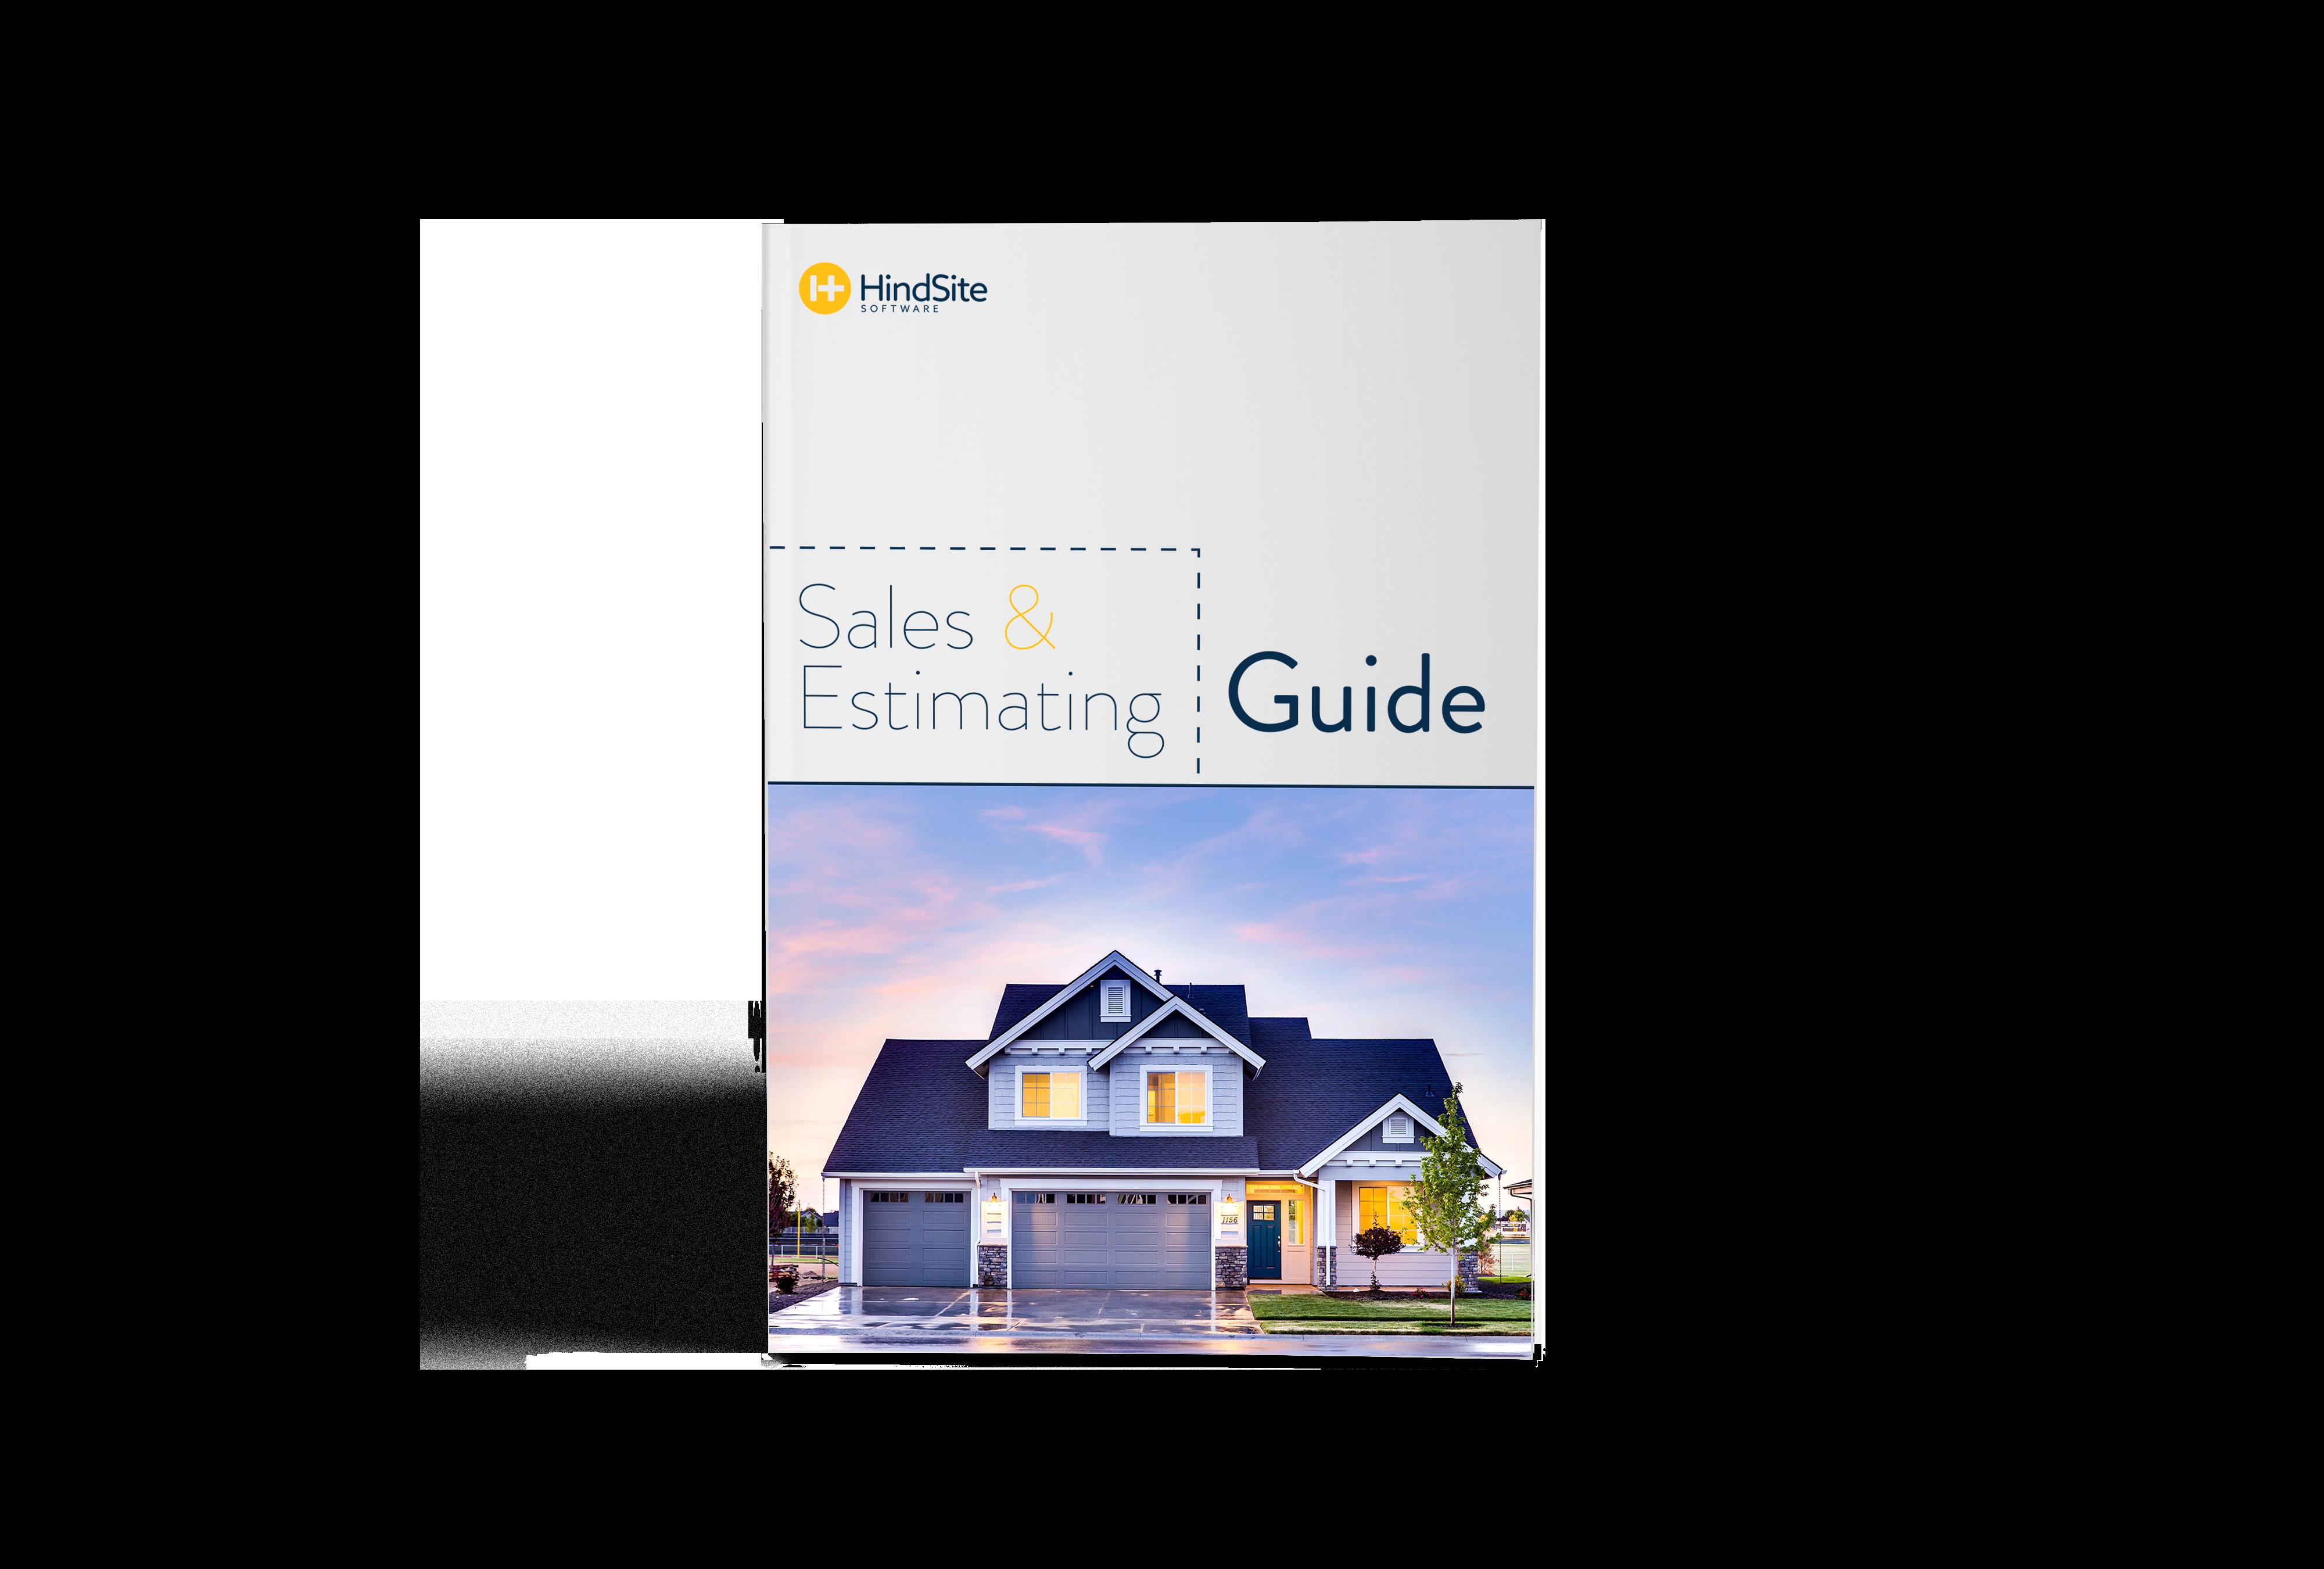 Sales & Estimating Mock Cover